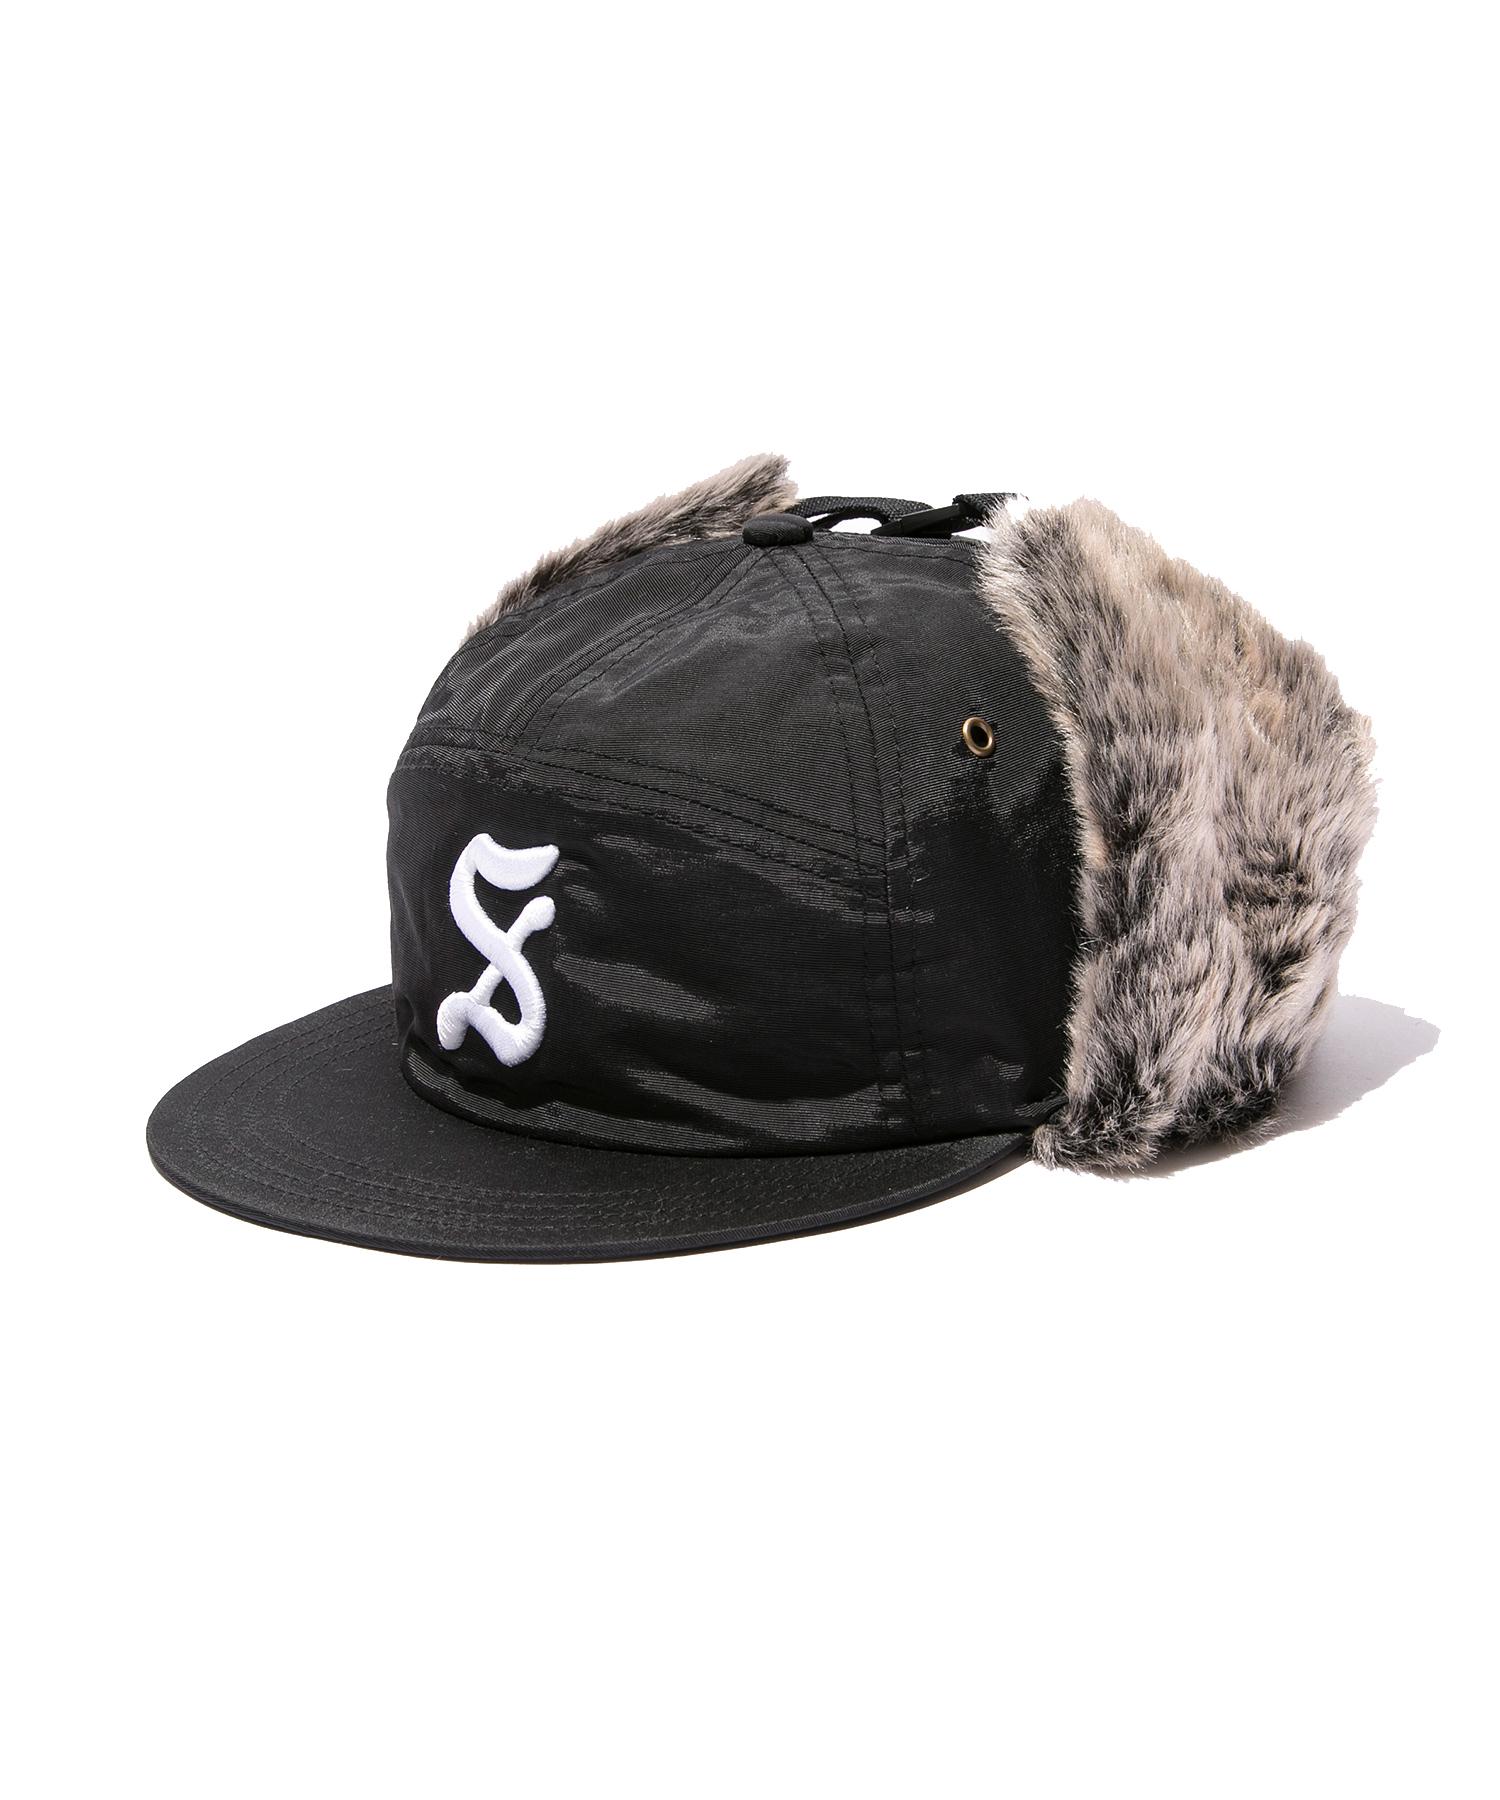 Subciety(サブサエティ) | DOG EAR CAP (Black)